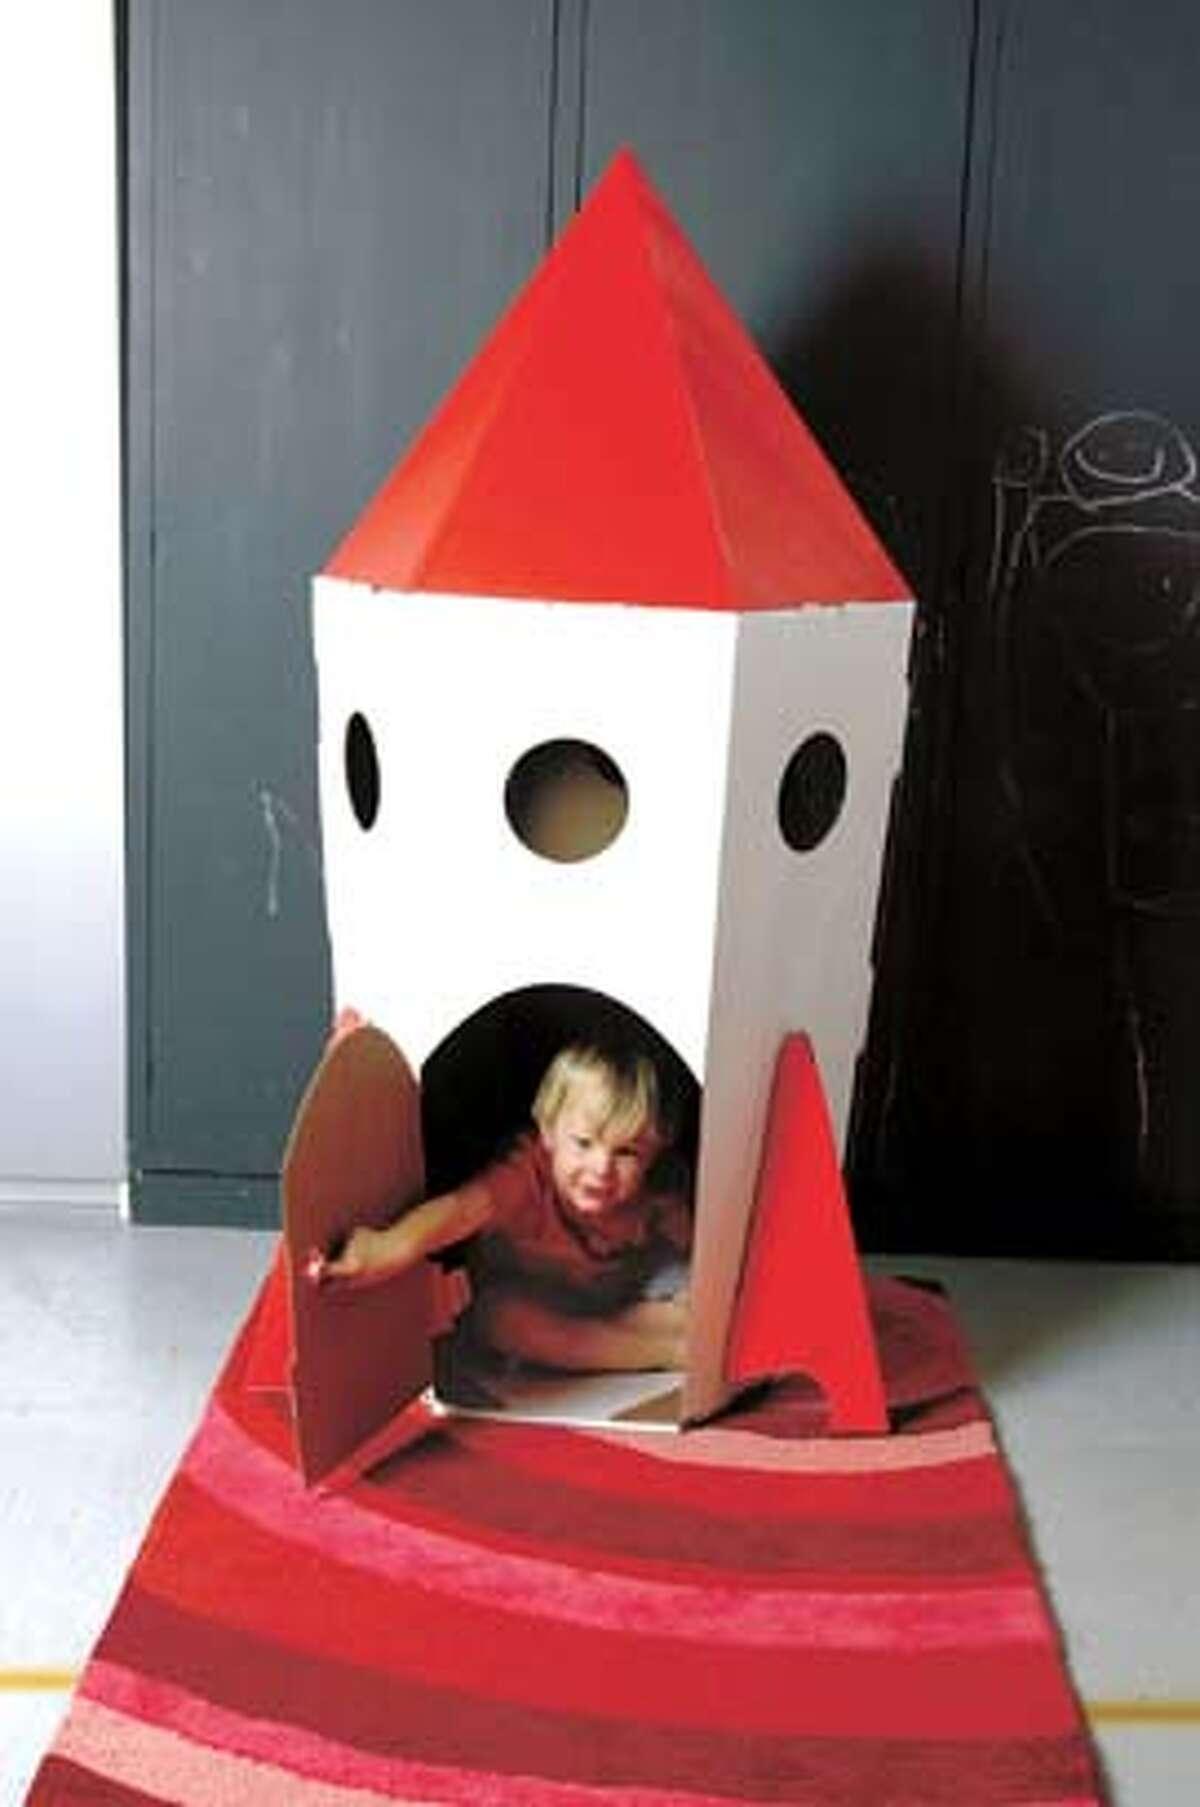 DESIGN_03.JPG Rocket playhouse, courtesy Modernmini. Photo by HANDOUT / Handout